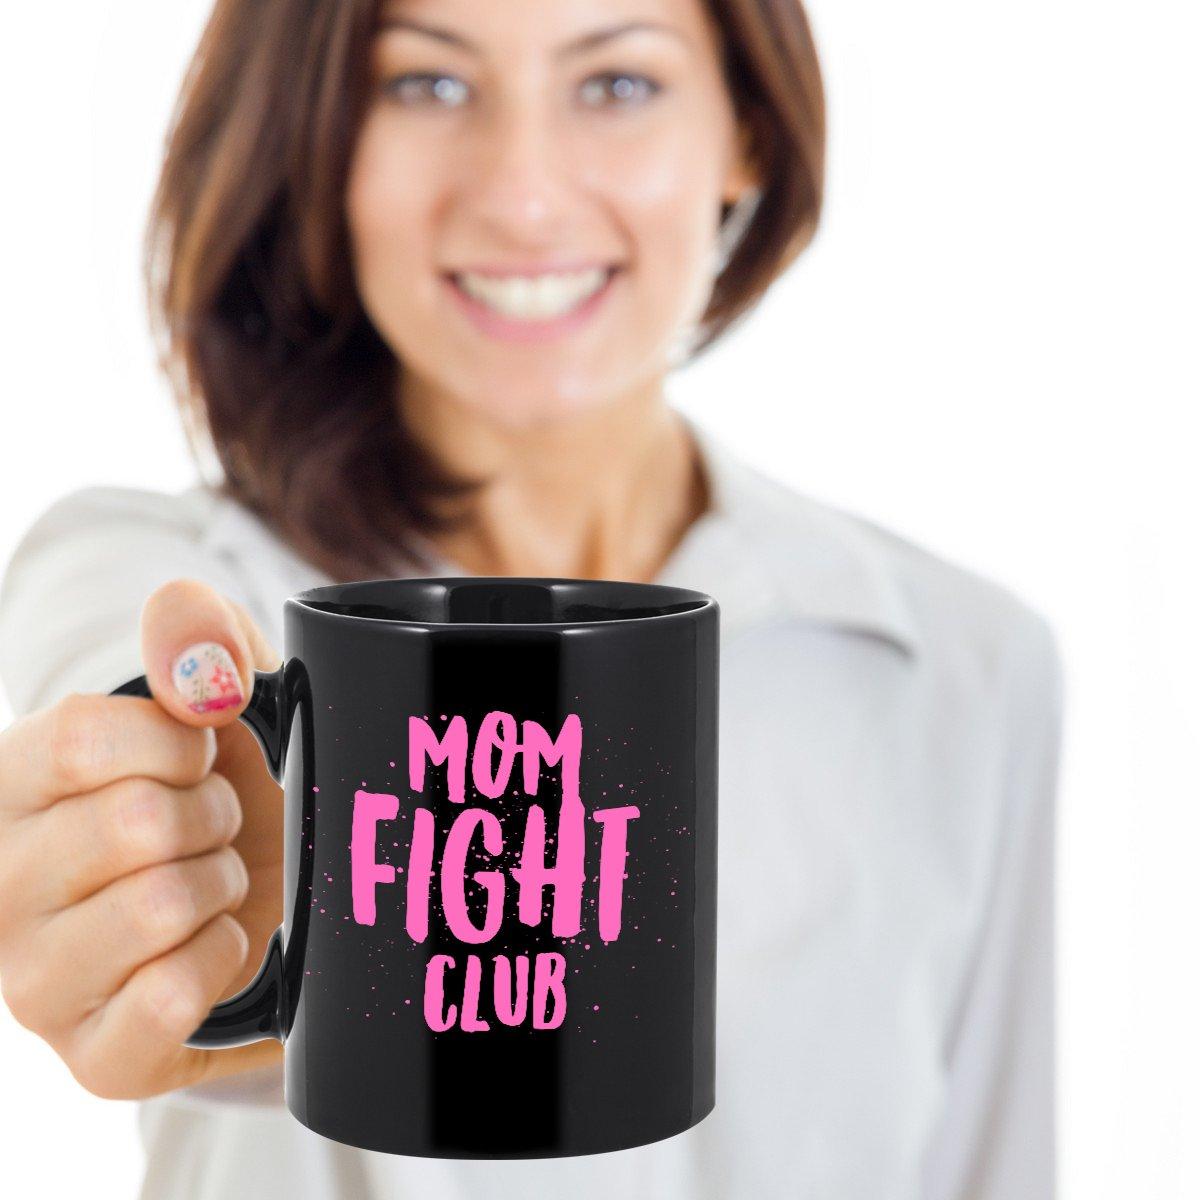 It's time to throw down! #MomFightClub #SundayMorning #AMJoy https://t.co/rE1kNjRziD https://t.co/MOwwLnApLN